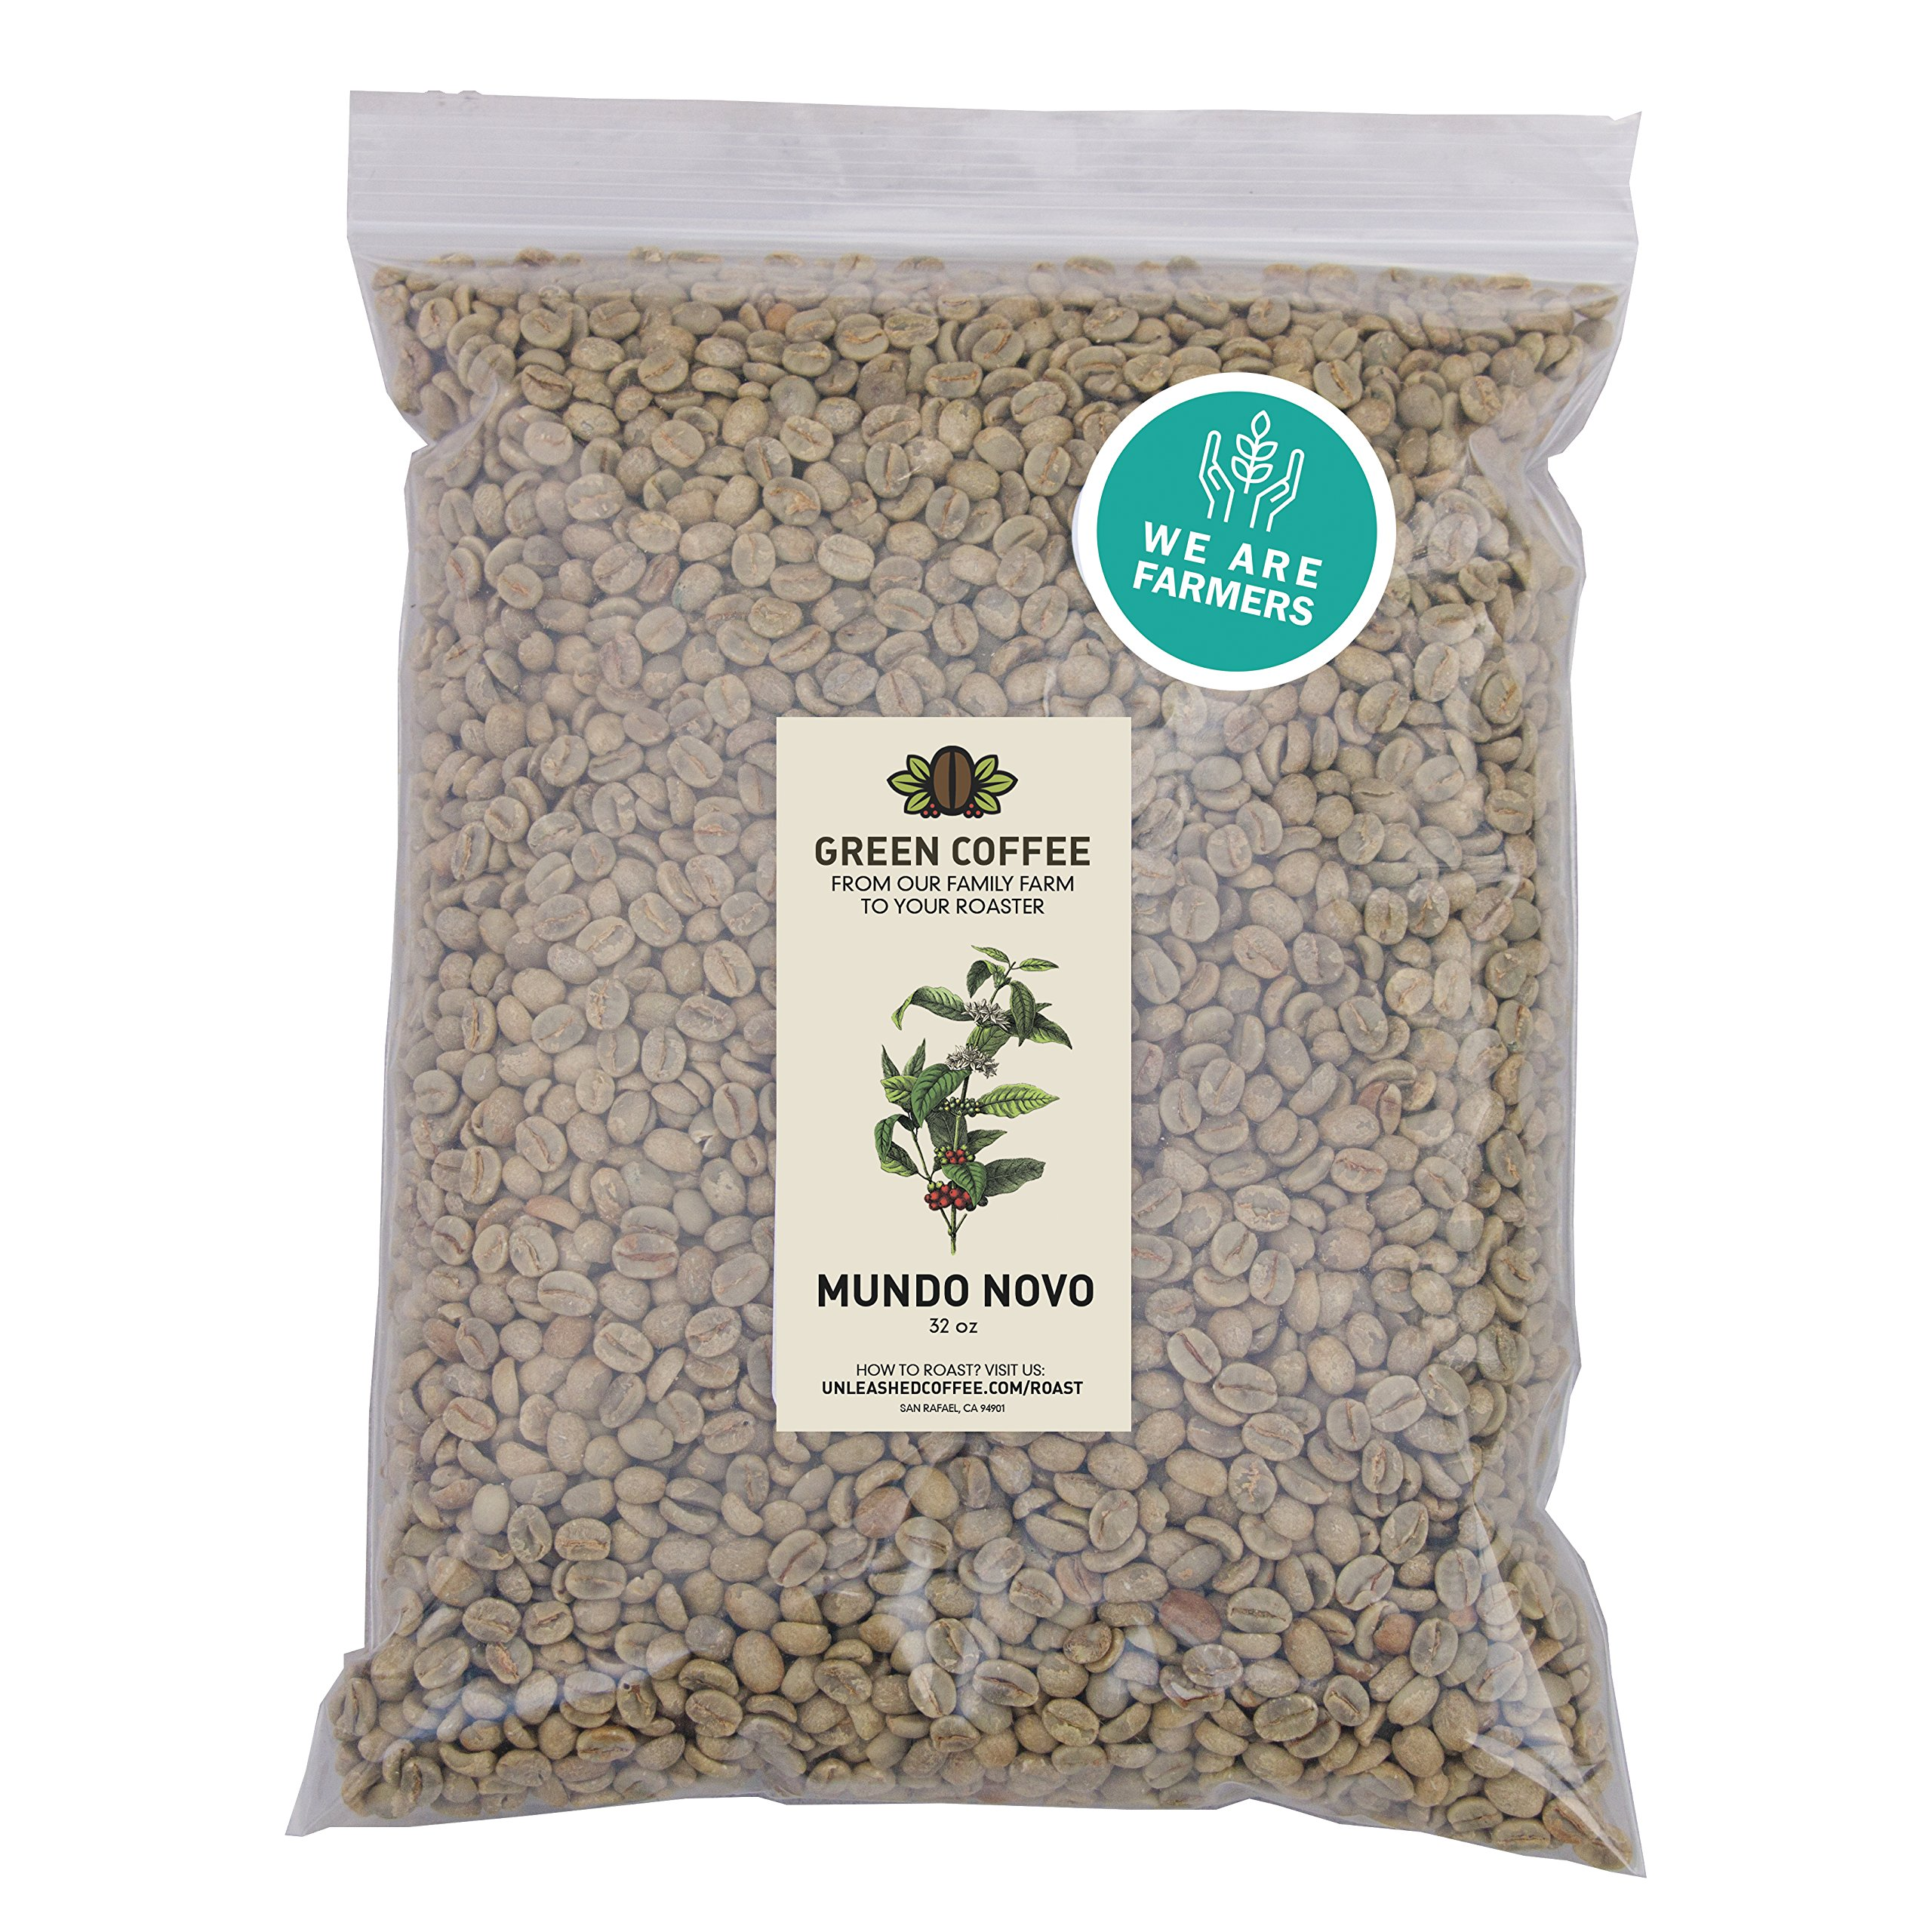 2lb Green Unroasted Coffee Mundo Novo varietal - From our family farm